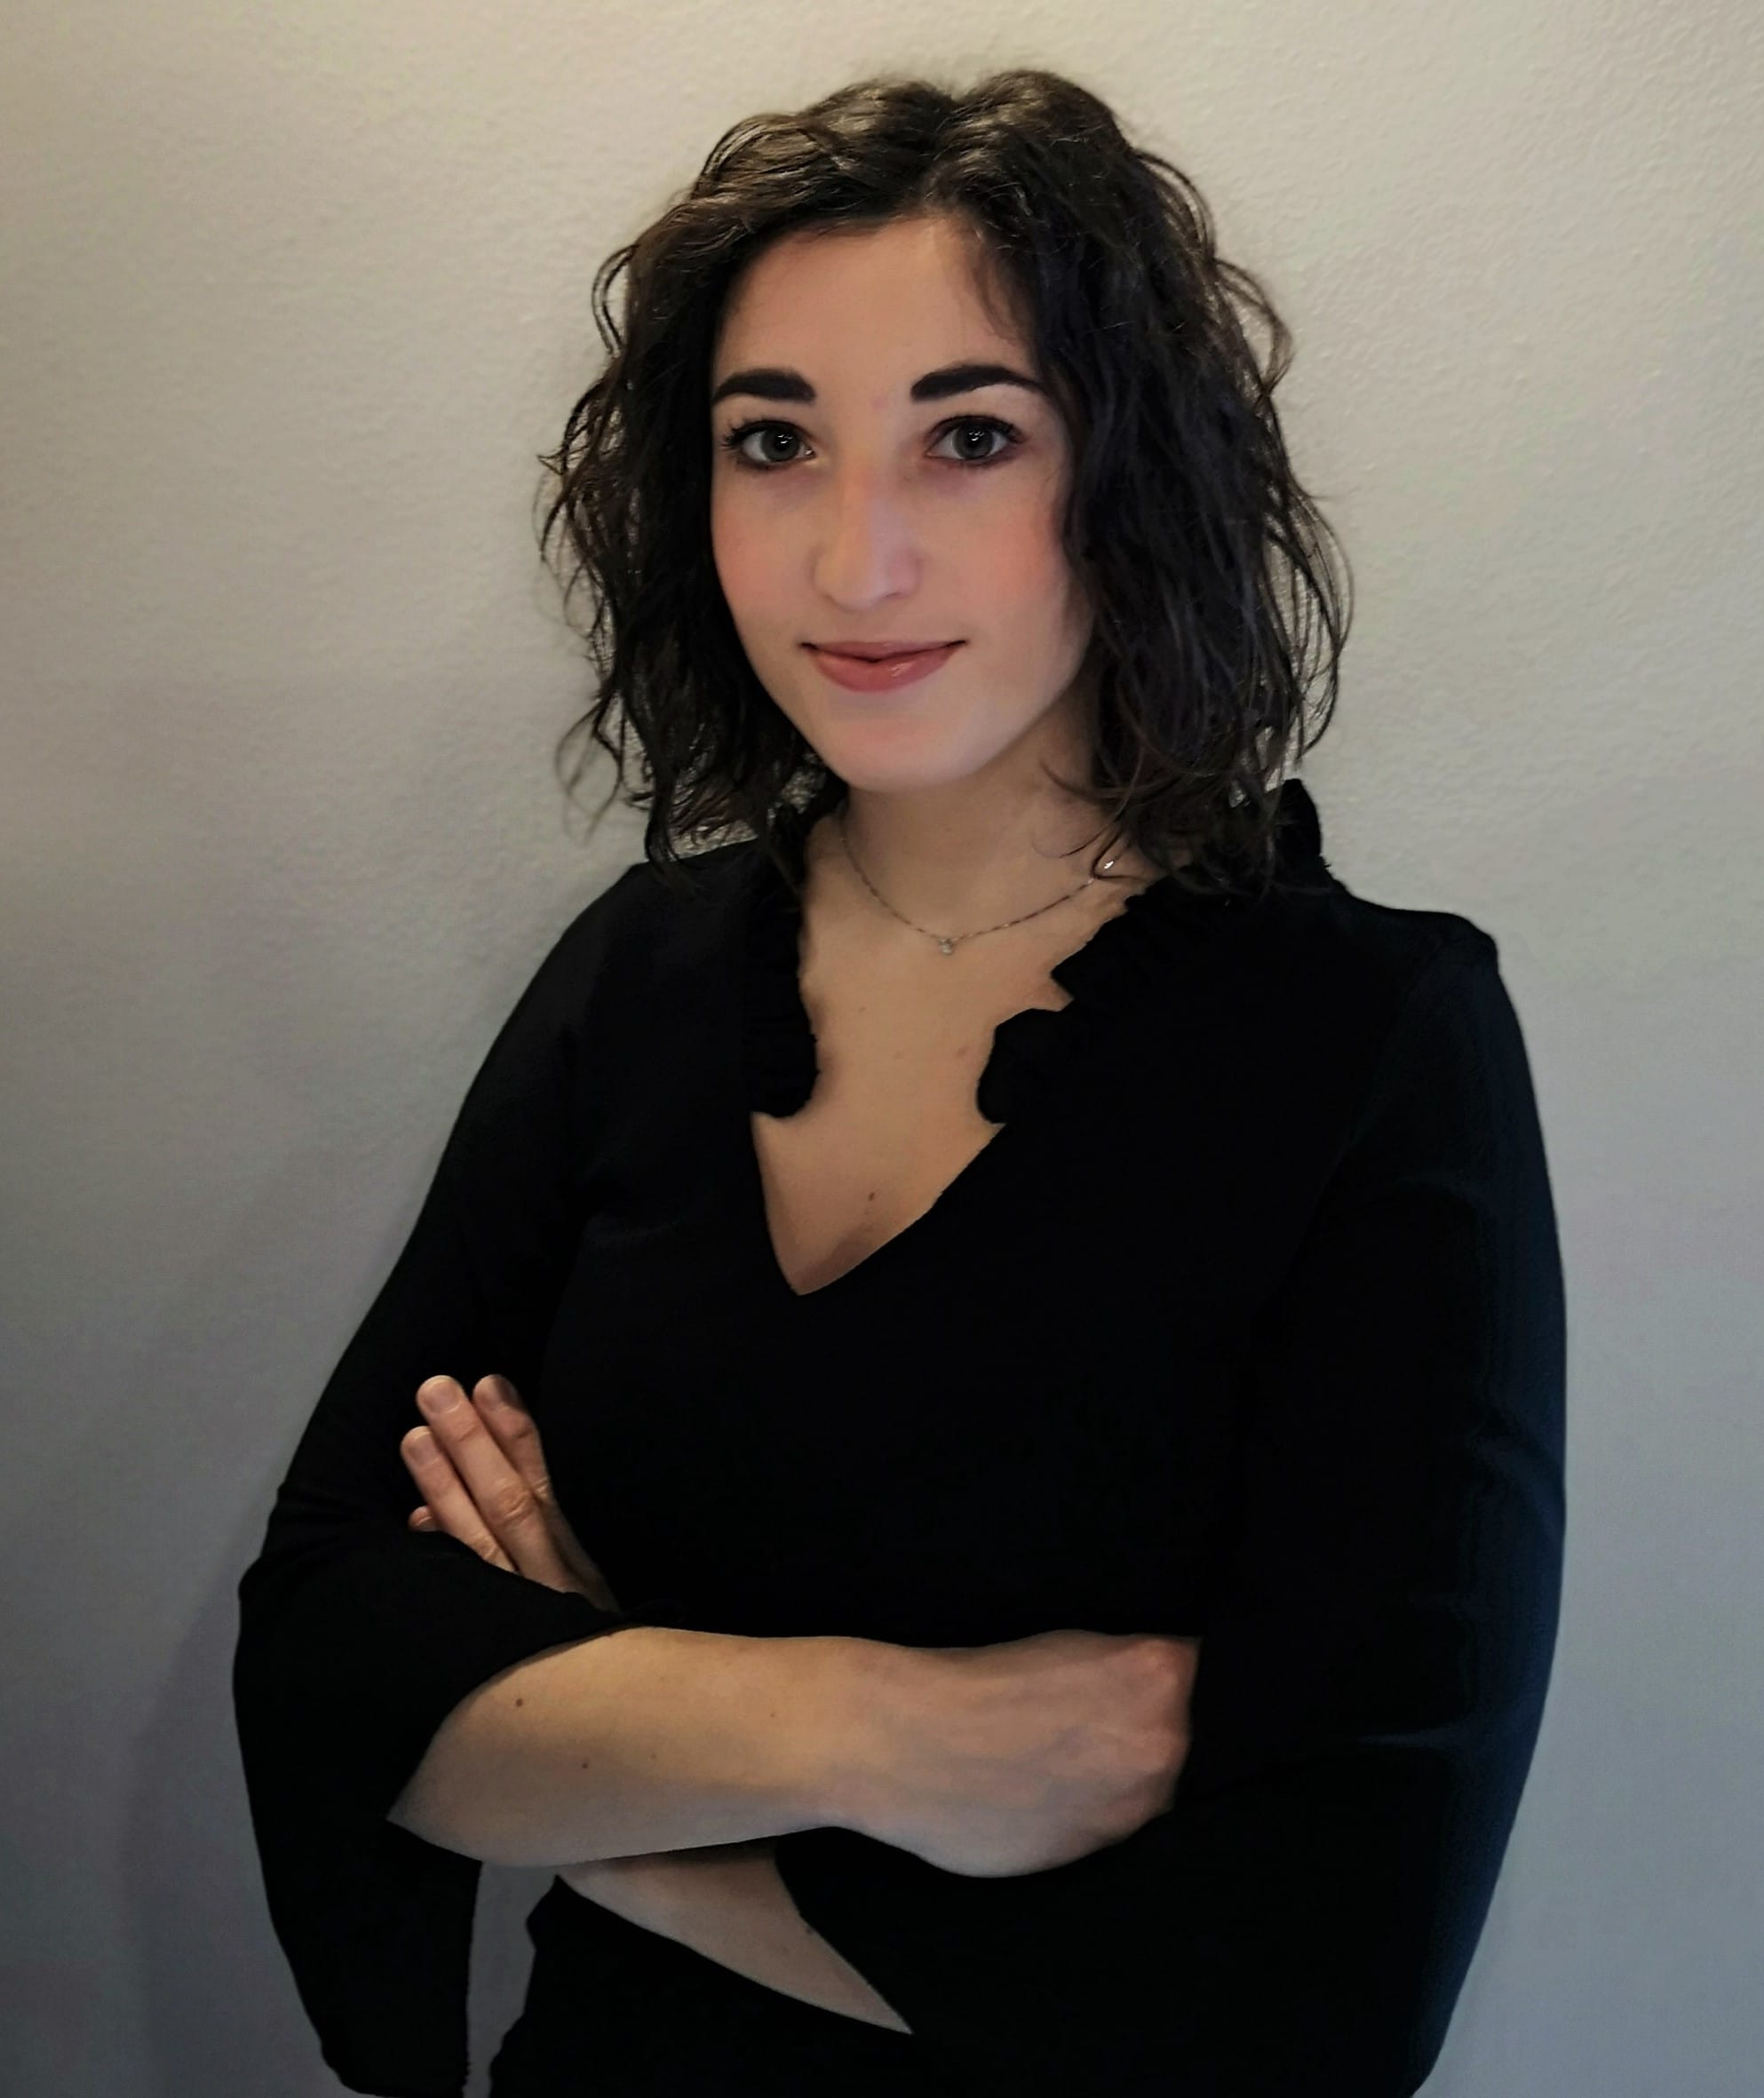 Elisa Brescianini